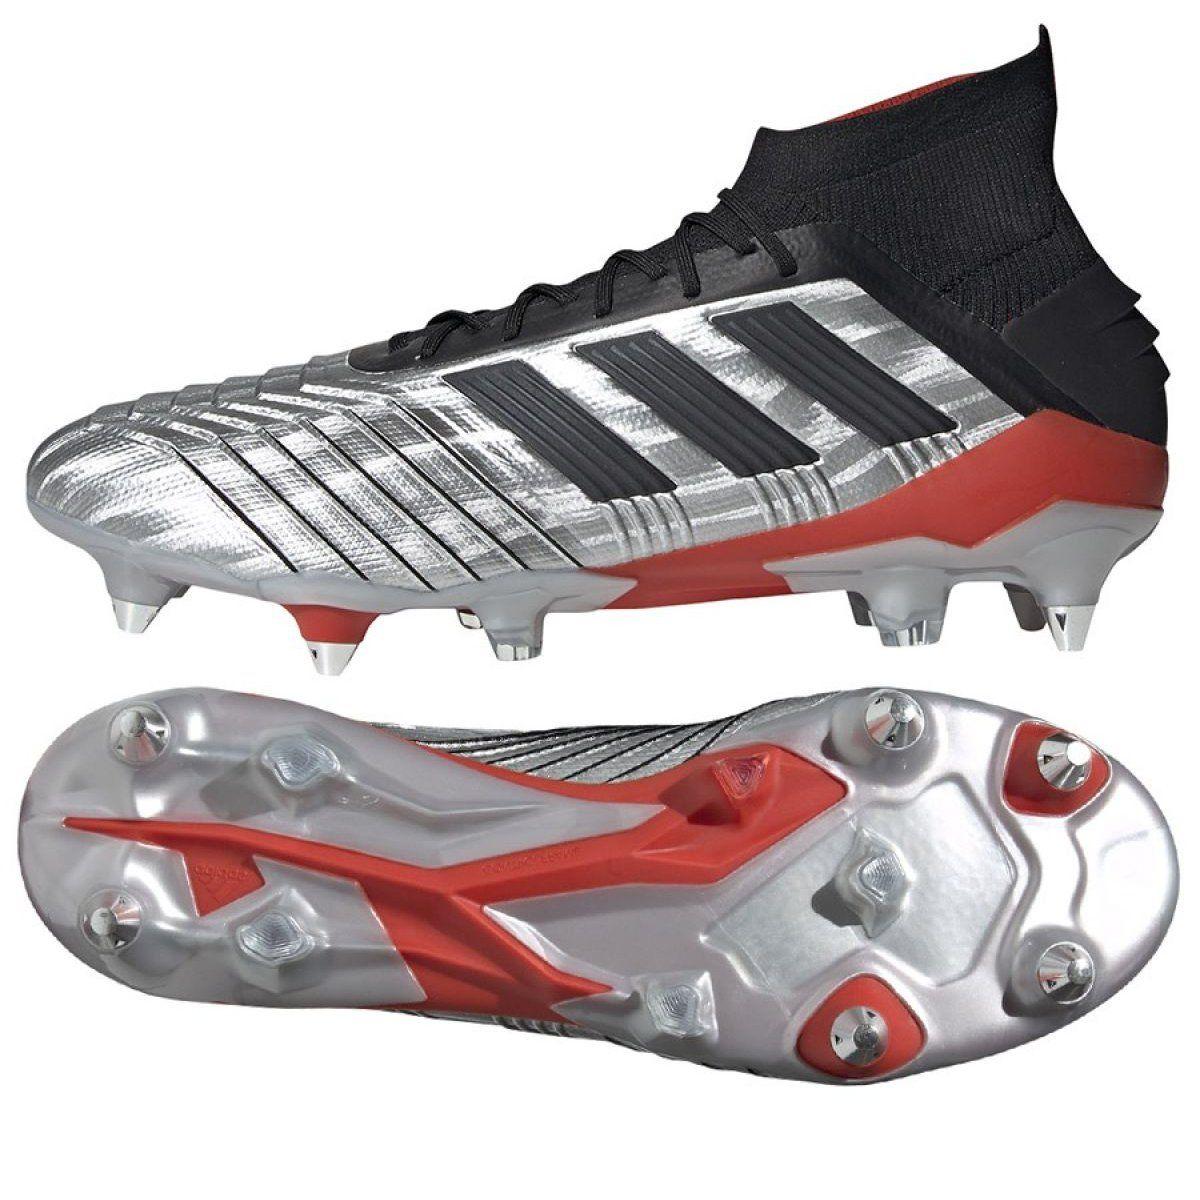 Football Boots Adidas Predator 19 1 Sg M F99986 Silver Multicolored Mens Football Boots Football Boots Adidas Predator